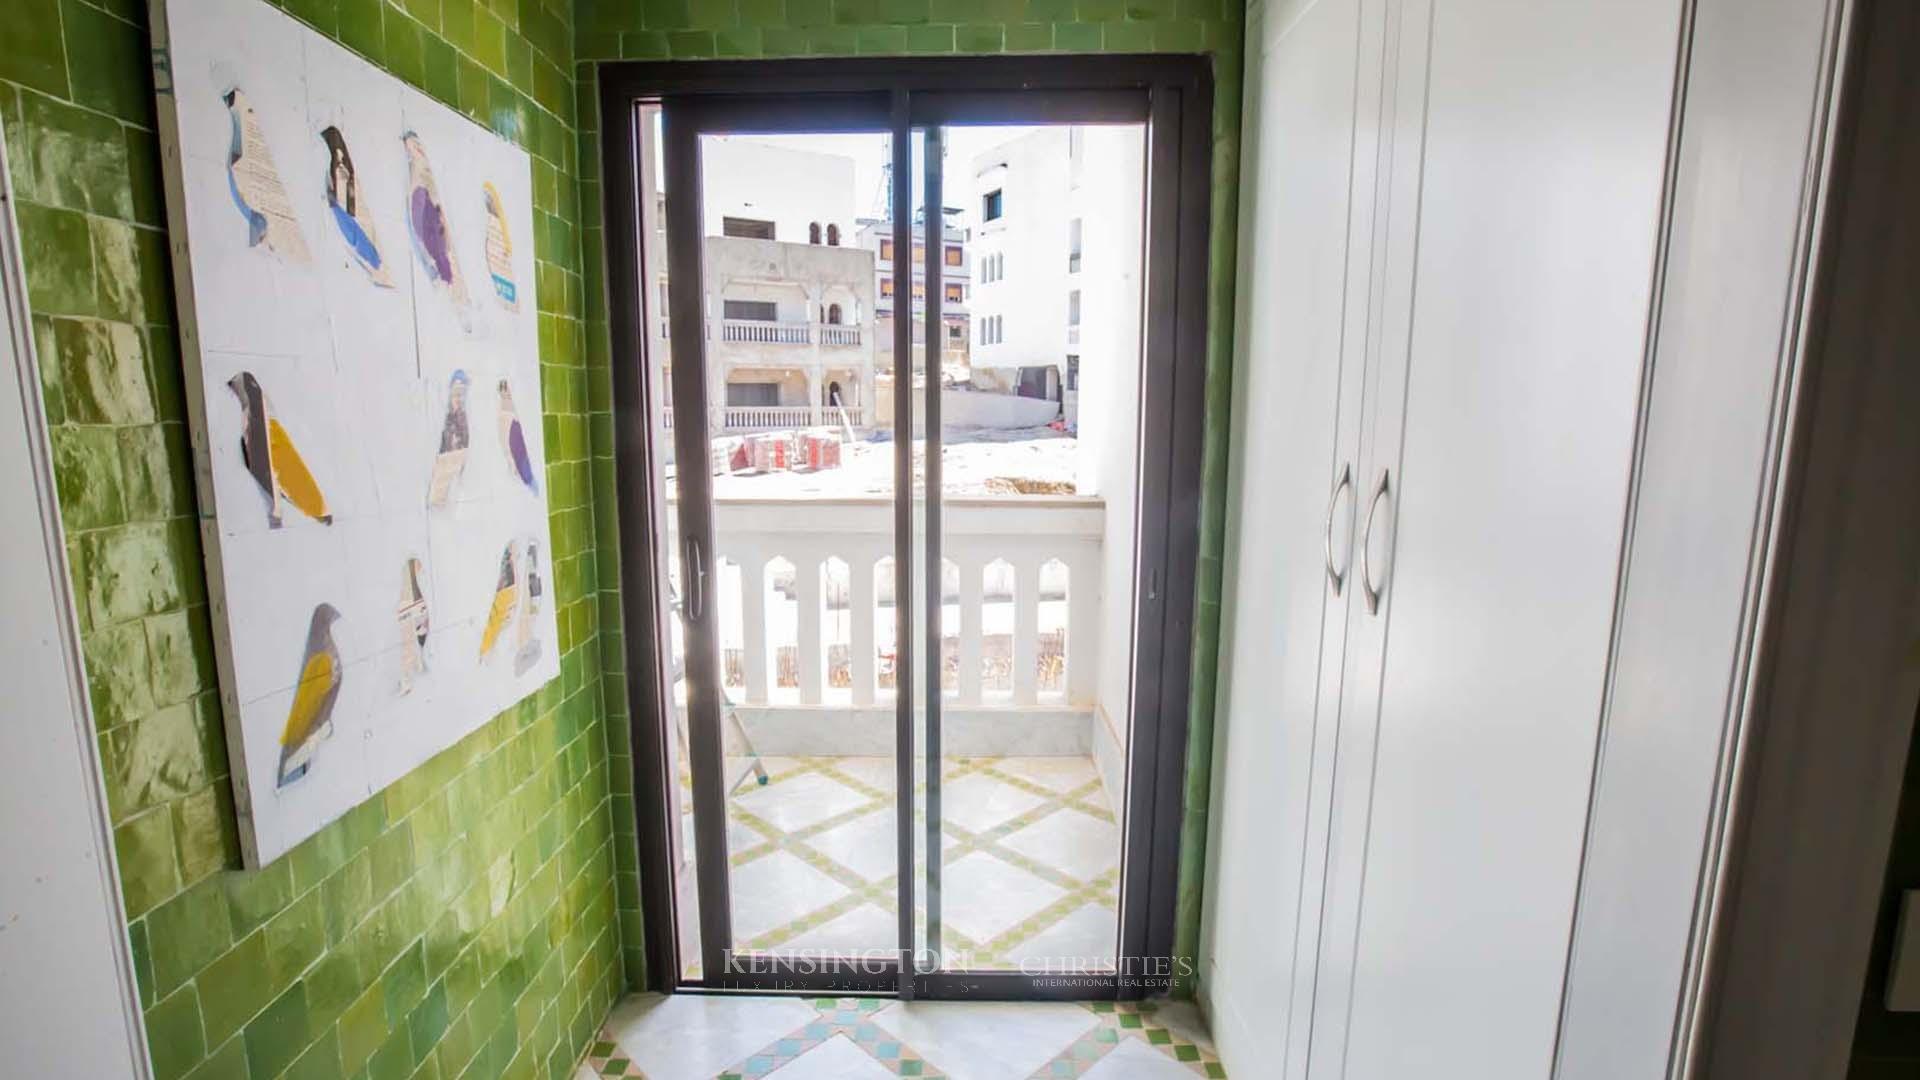 KPPM00998: Apartment Pola Apartment Tanger Morocco